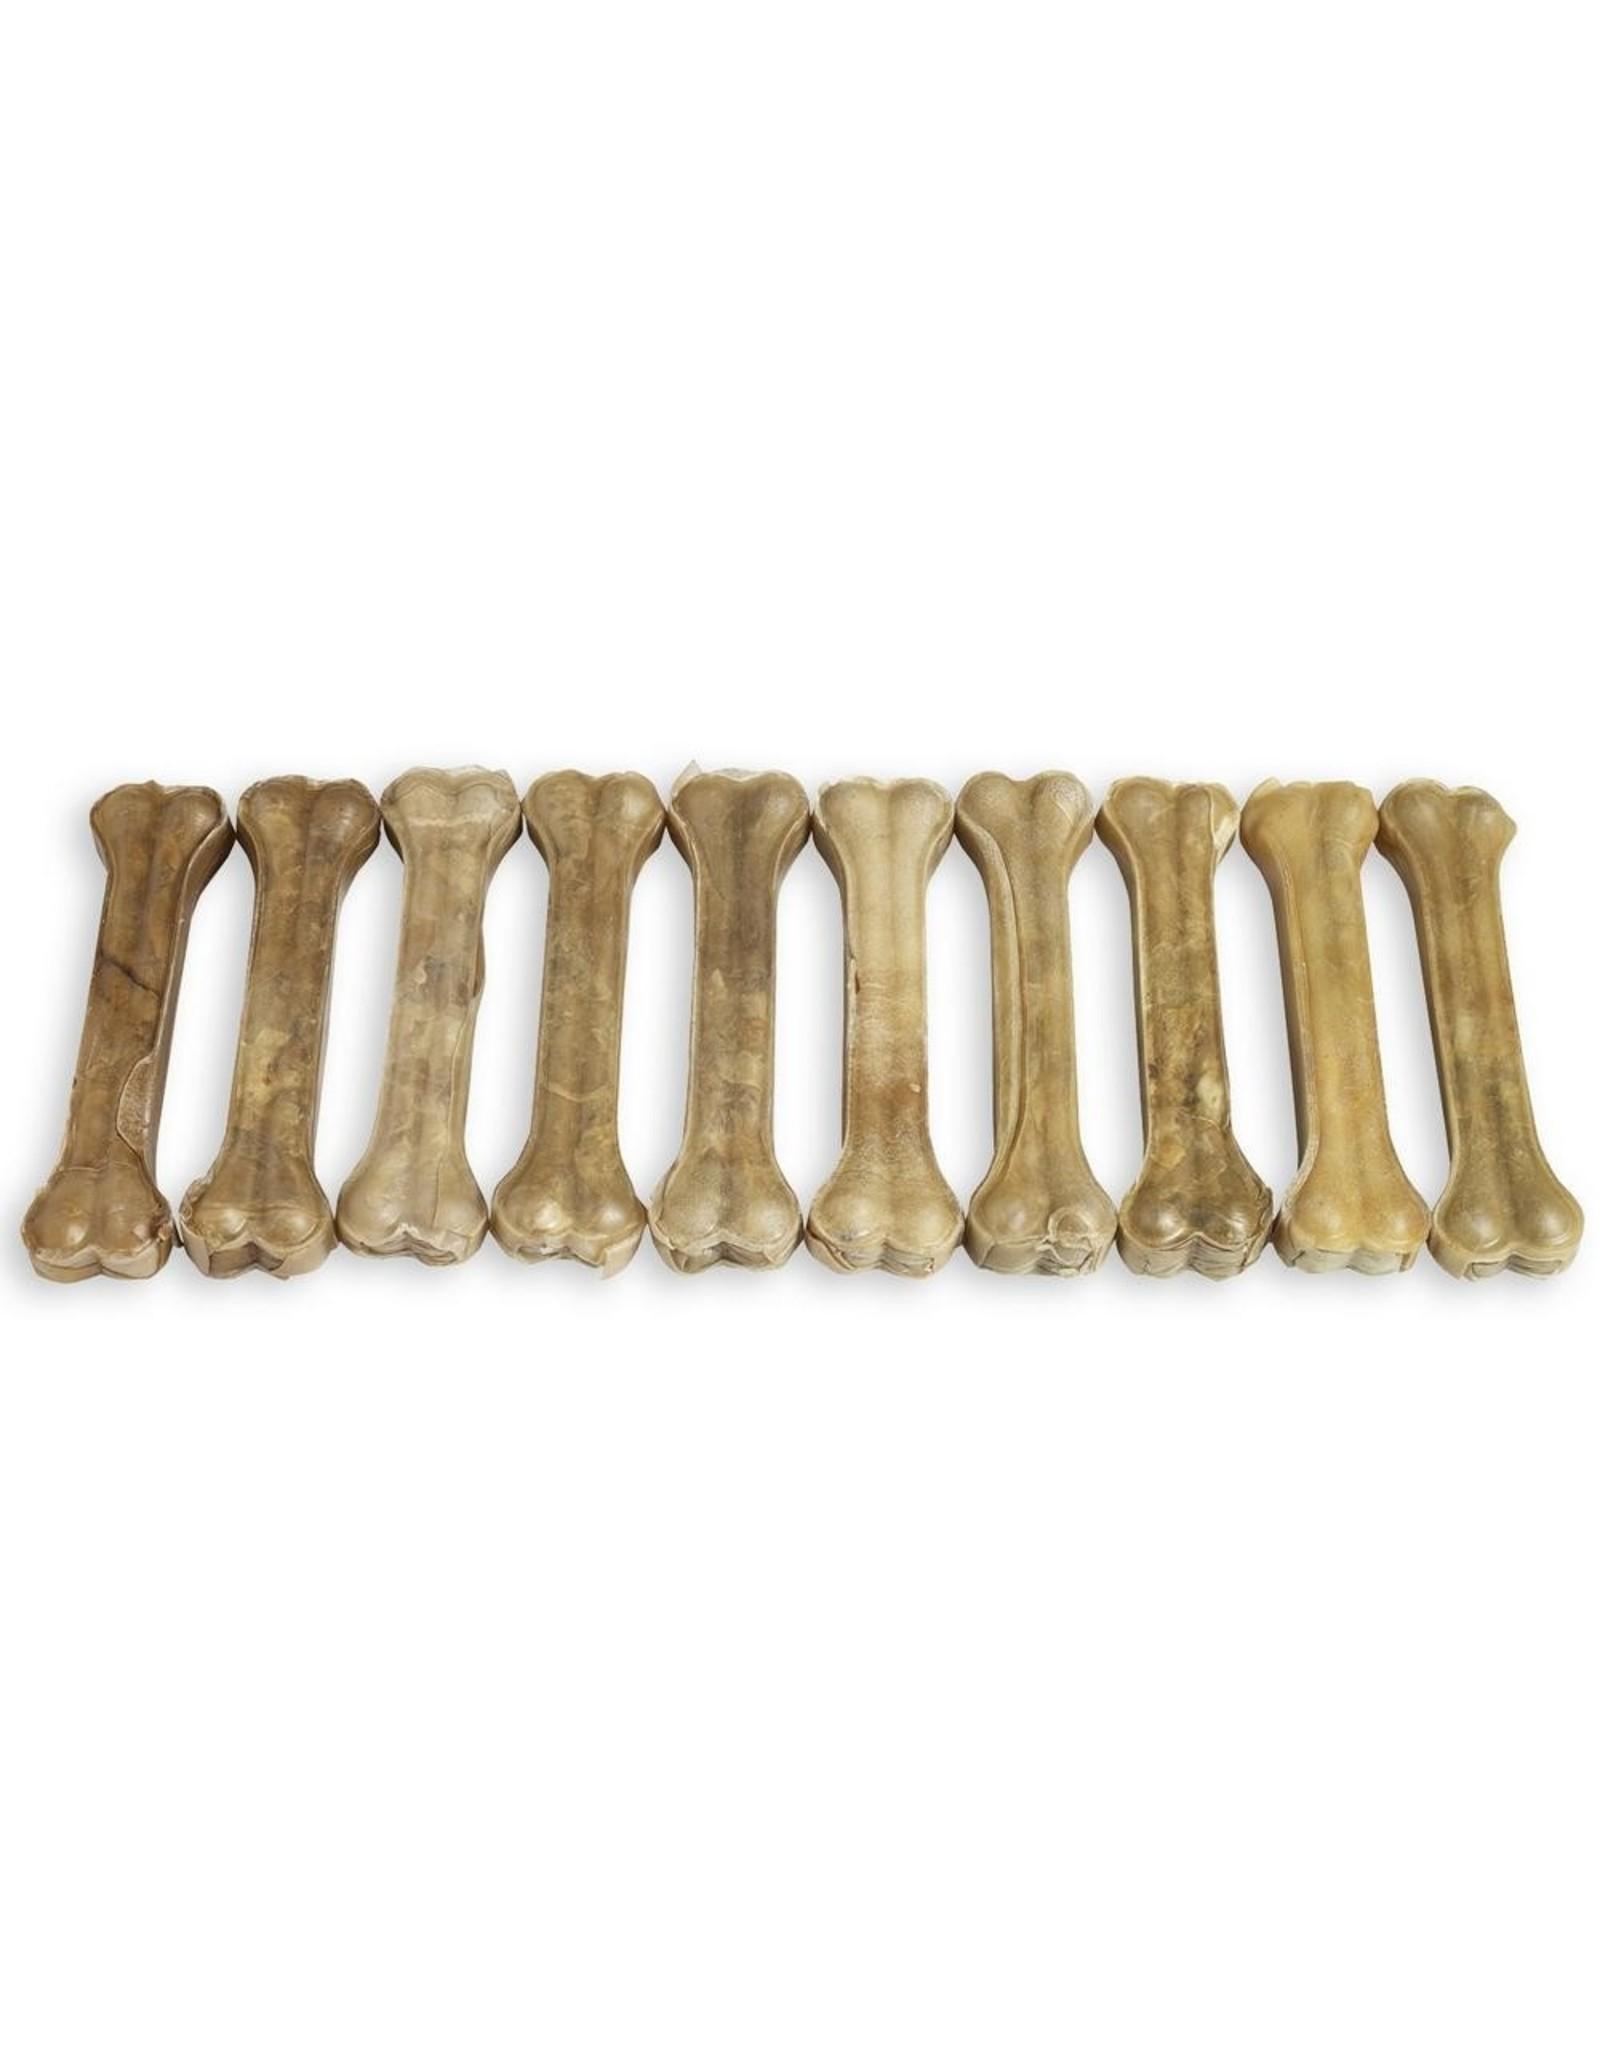 Antos Pressed Bone middel 22 cm - 1 ST